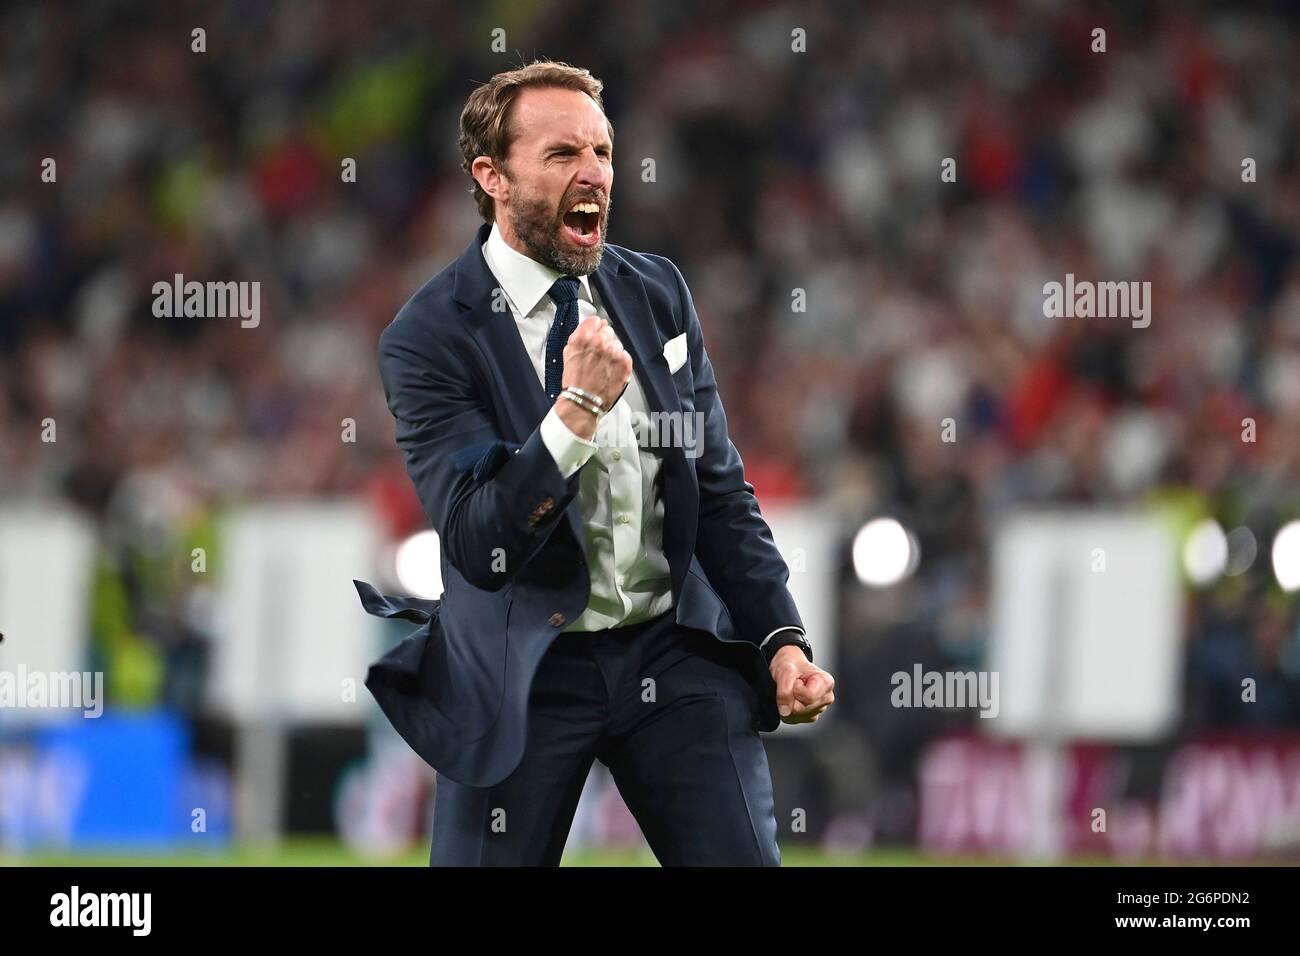 final jubilation Gareth SOUTHGATE (coach ENG), jubilation, joy, enthusiasm, single image, trimmed single motif, half figure, half figure. Semi-final, game M50, England (ENG) - Denmark (DEN) 2-1 nV on 07.07.2021 in London/Wembley Stadium. Football EM 2020 from 06/11/2021 to 07/11/2021. Stock Photo